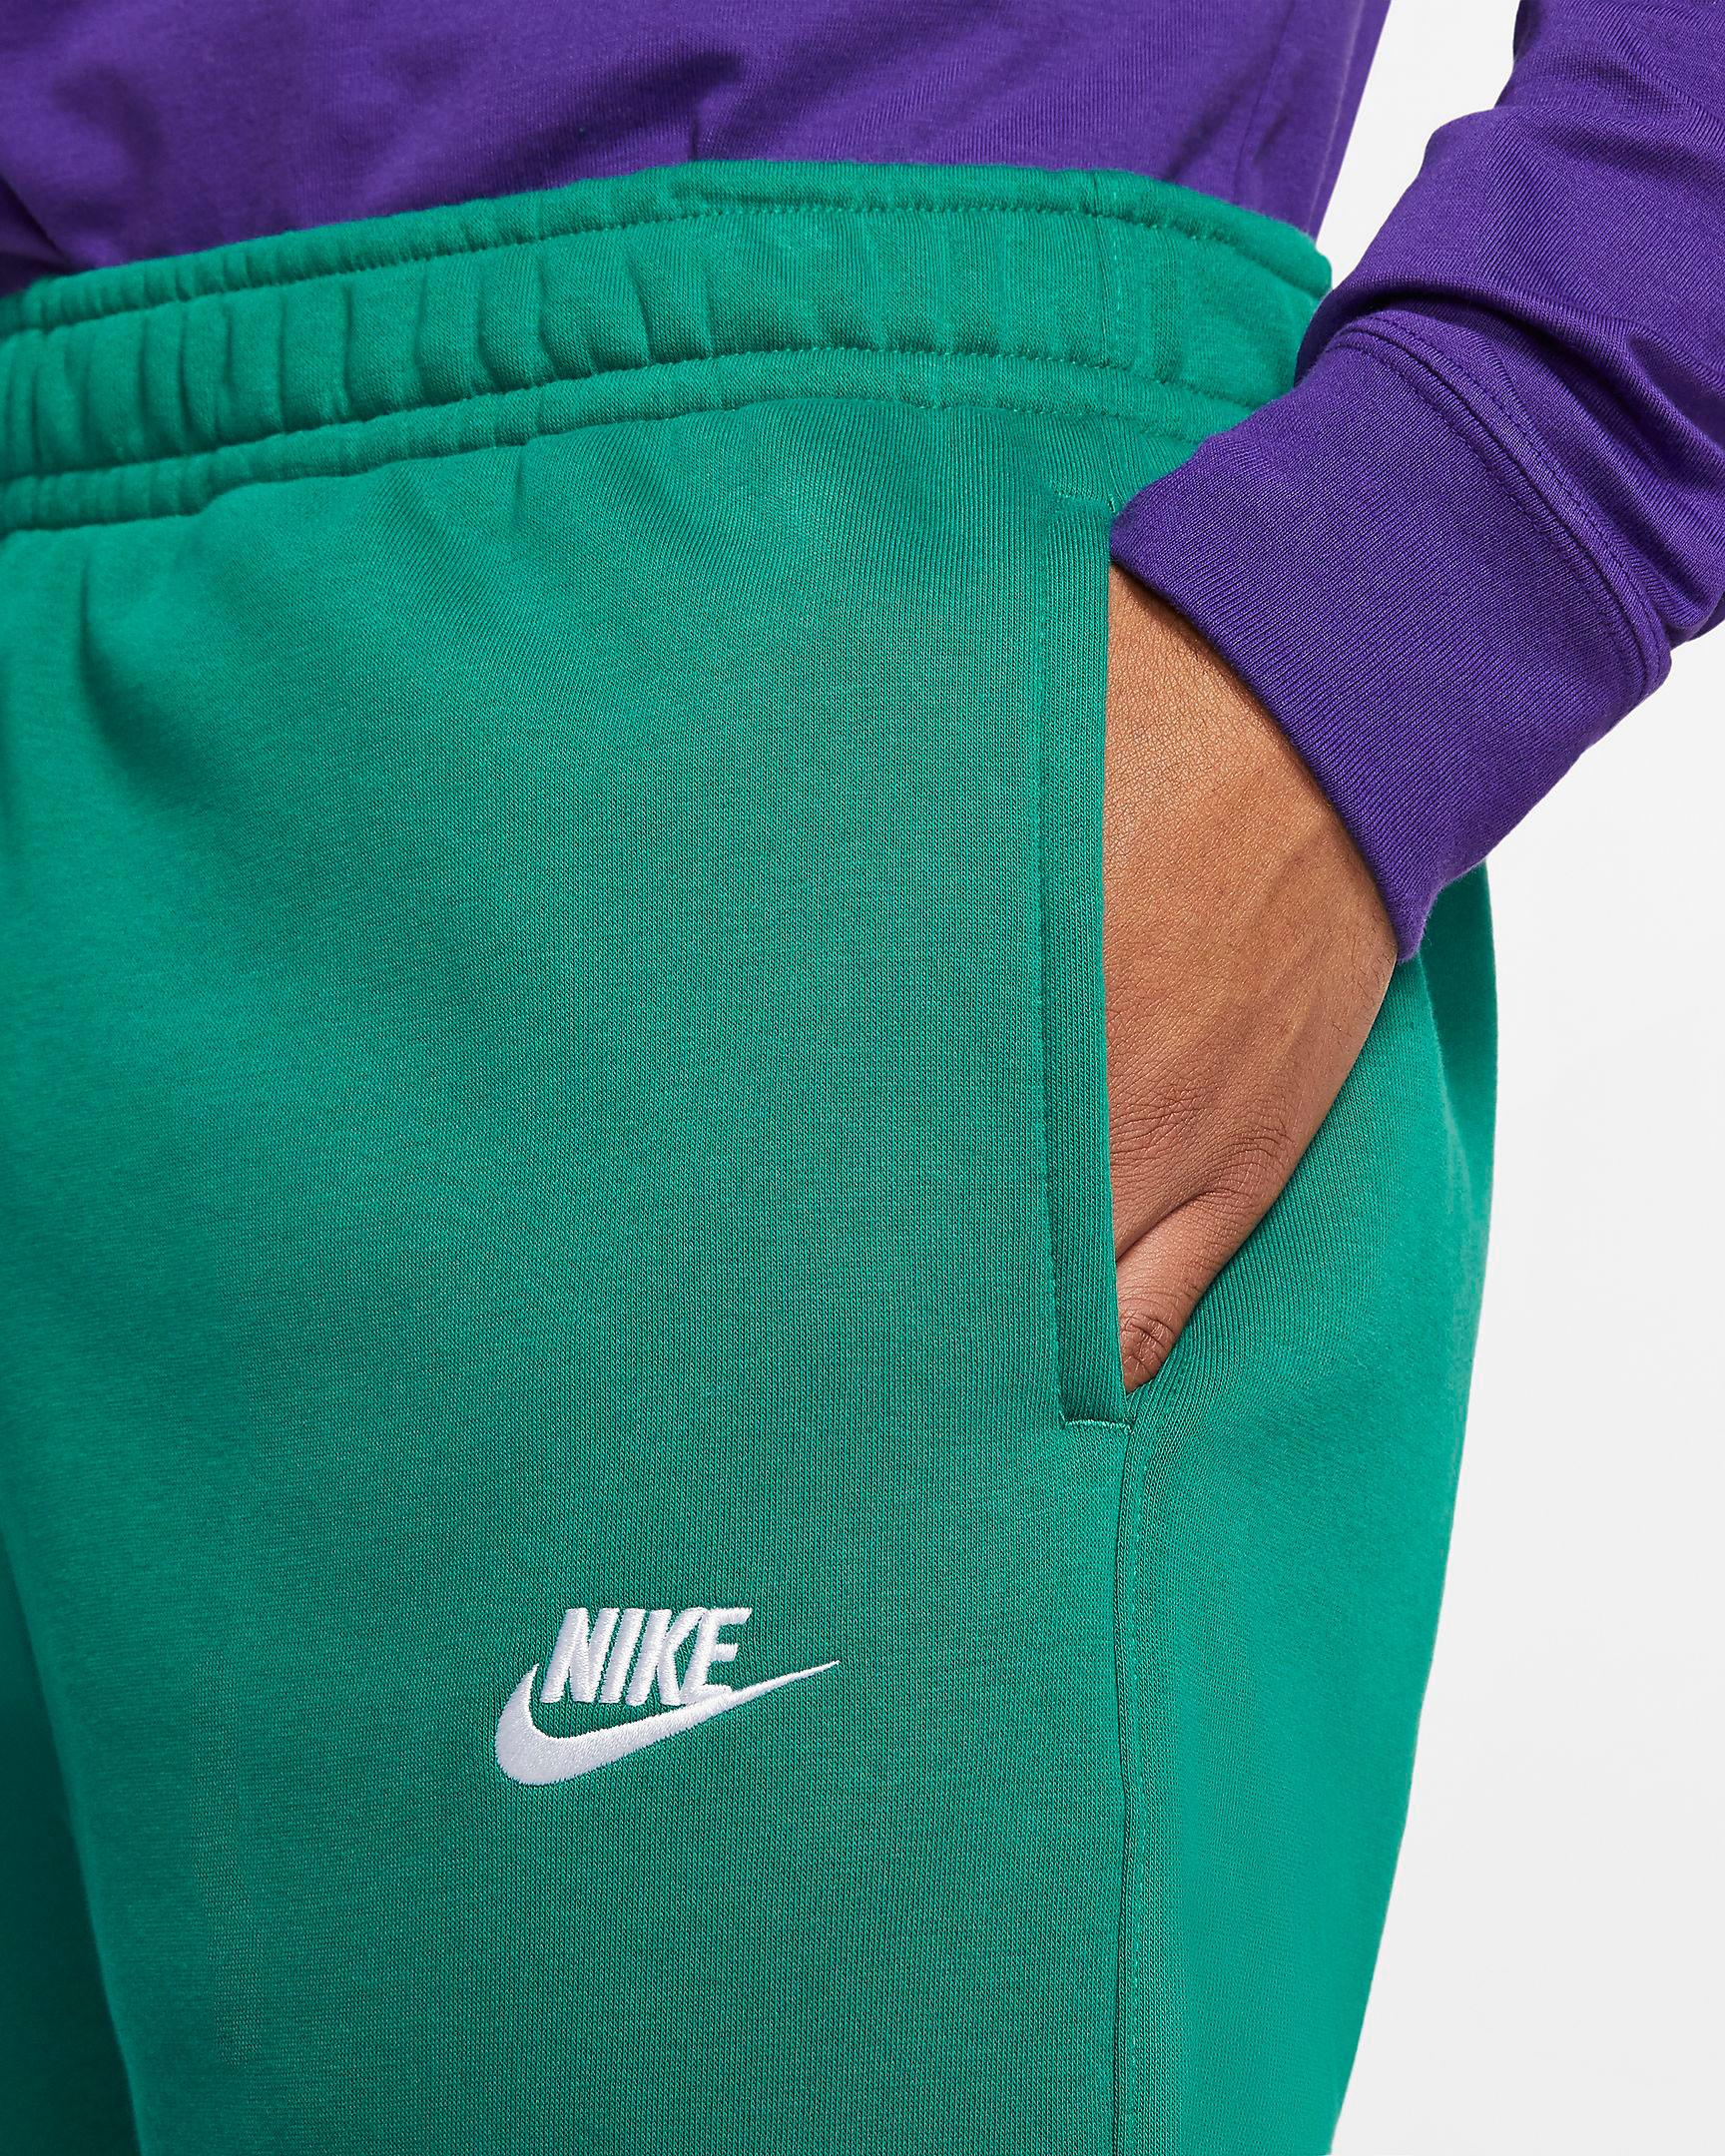 nike-island-green-just-do-it-fleece-joggers-2